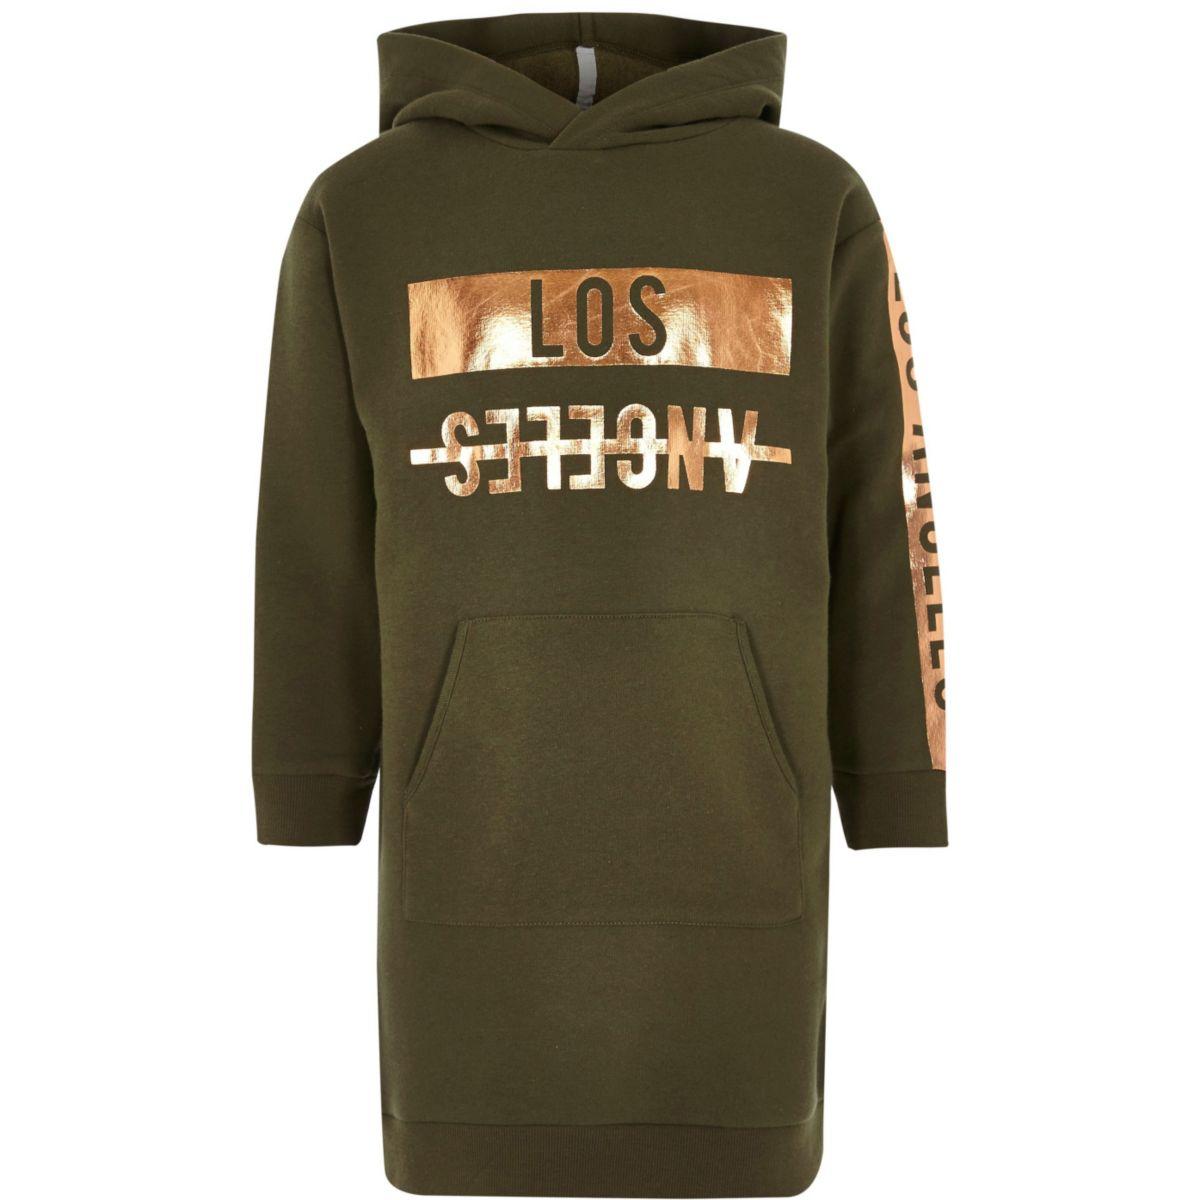 Girls khaki 'Los Angeles' print hoodie dress